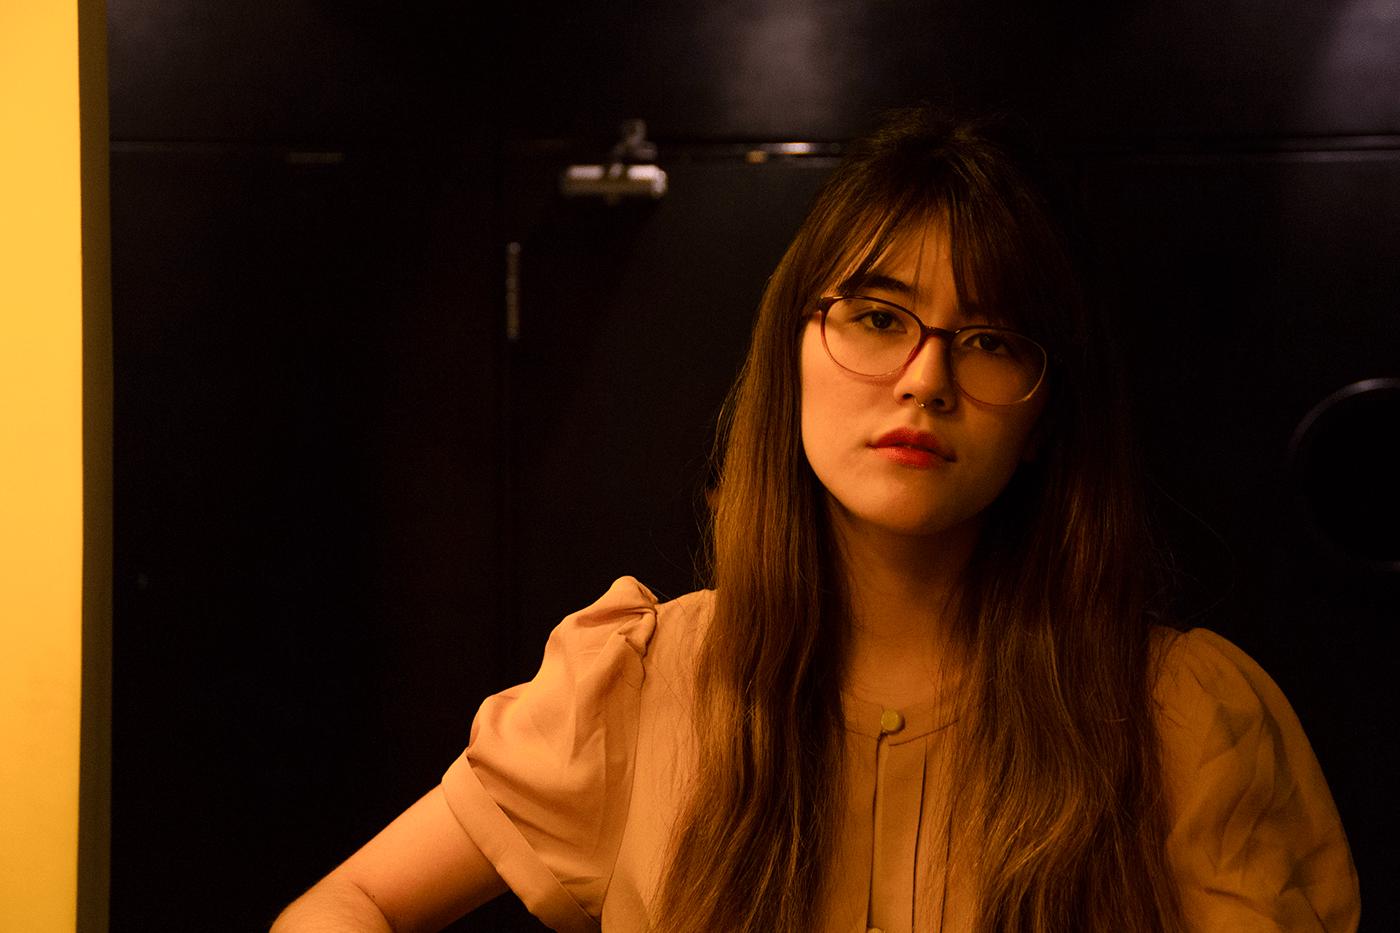 Julia Cortez - Elenco Digital